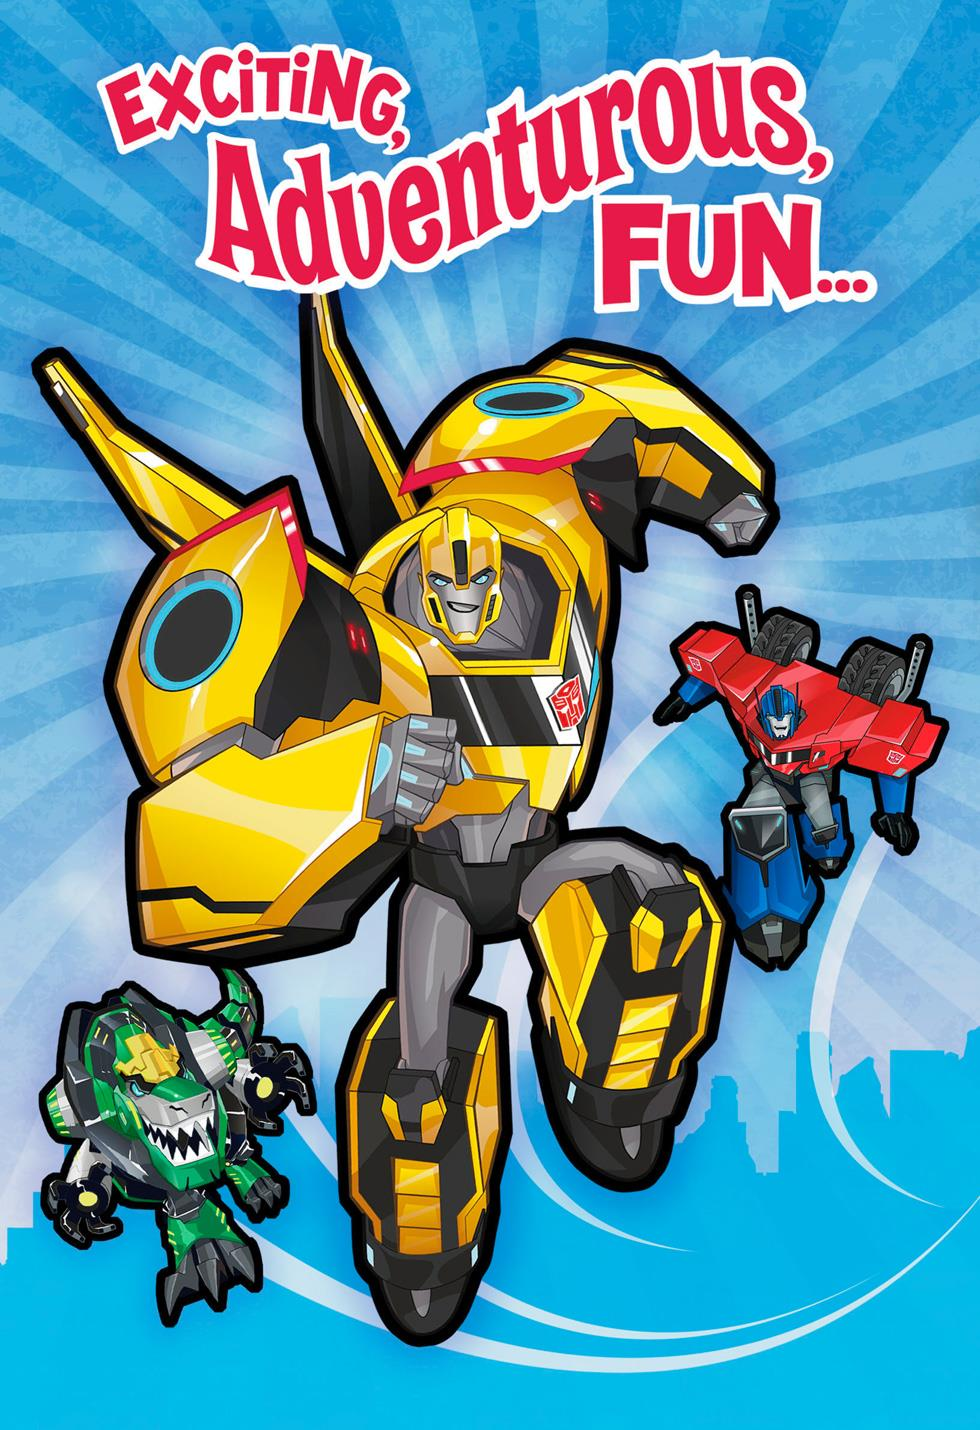 Transformers Exciting Adventurous Fun Birthday Card